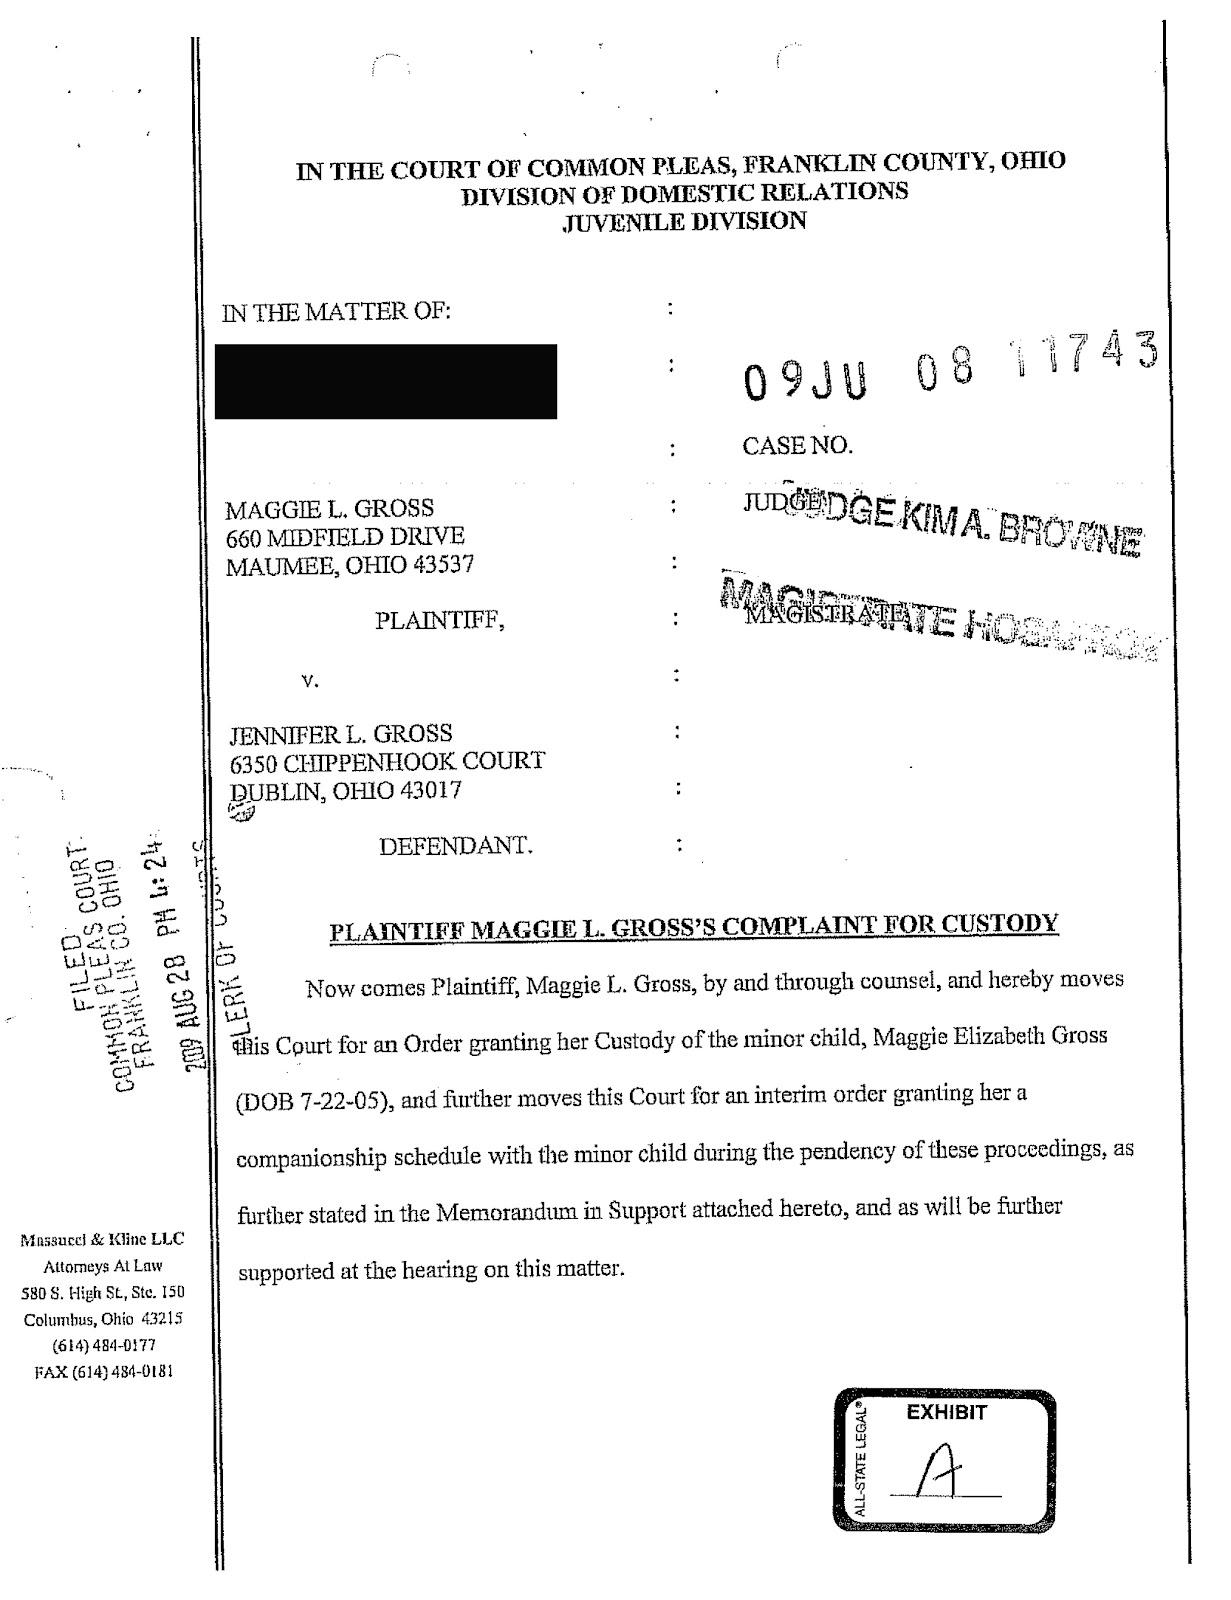 Franklin County Juvenile Court Judges disregard Ohio law and